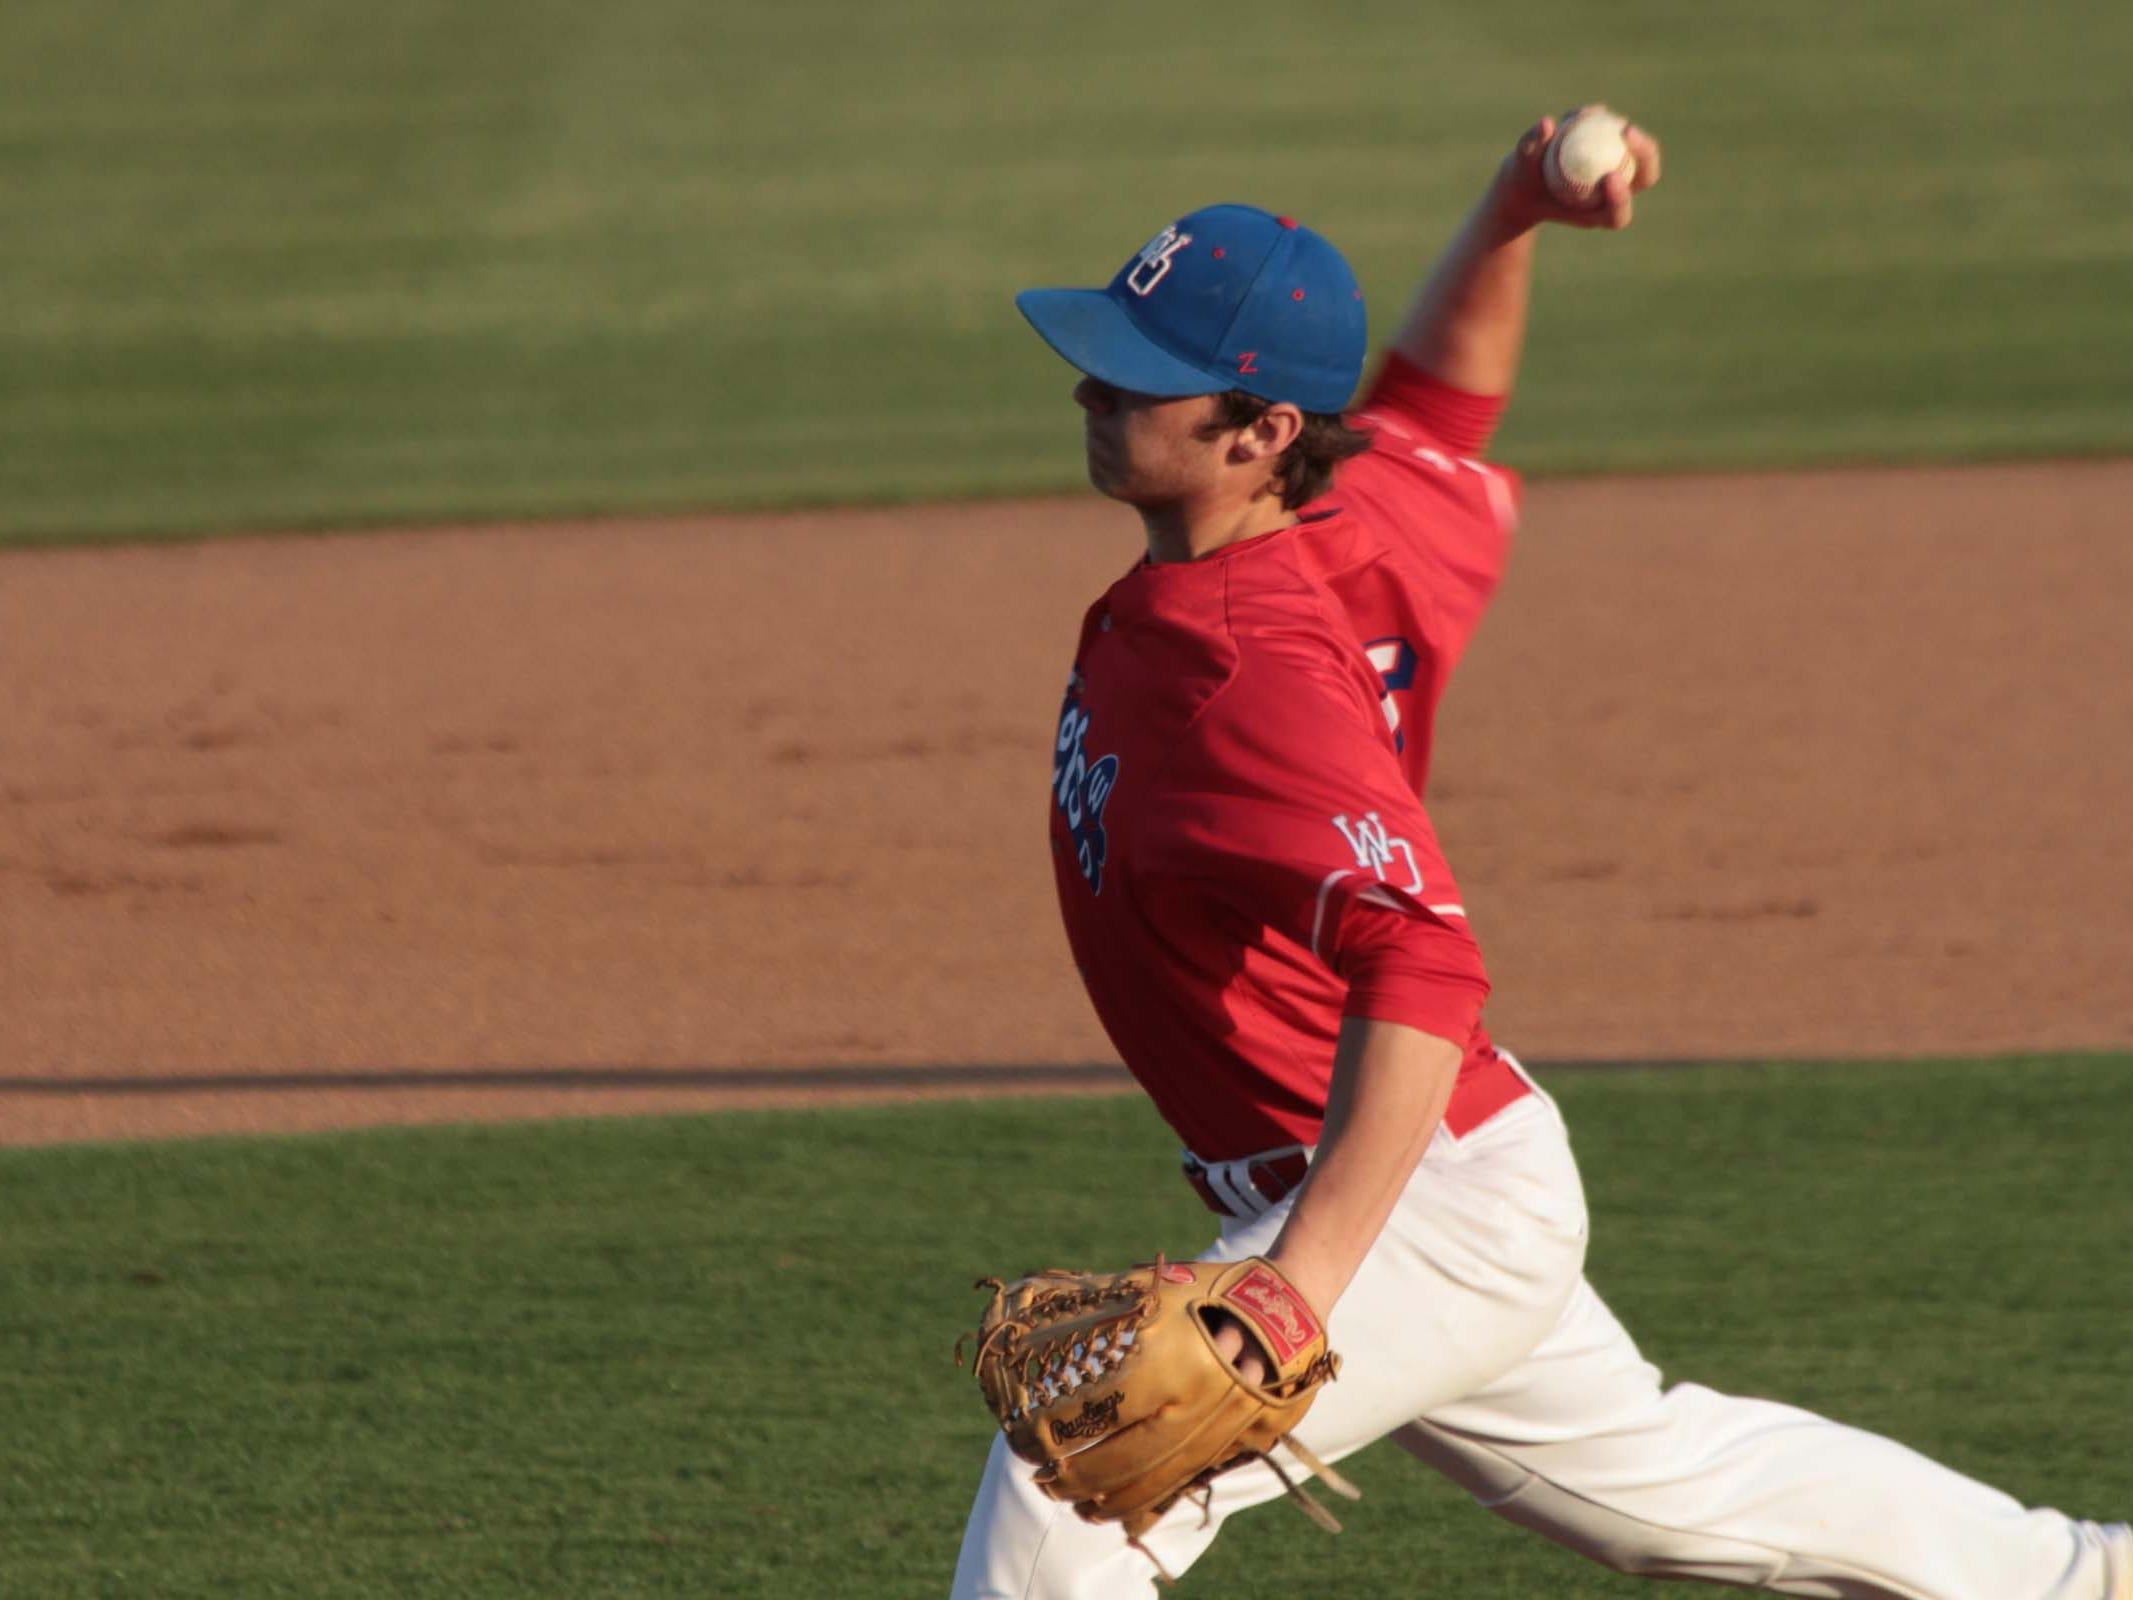 West Ouachita hosts South Terrebonne Tuesday at 5 p.m. to begin the LHSAA Class 4A baseball playoffs.